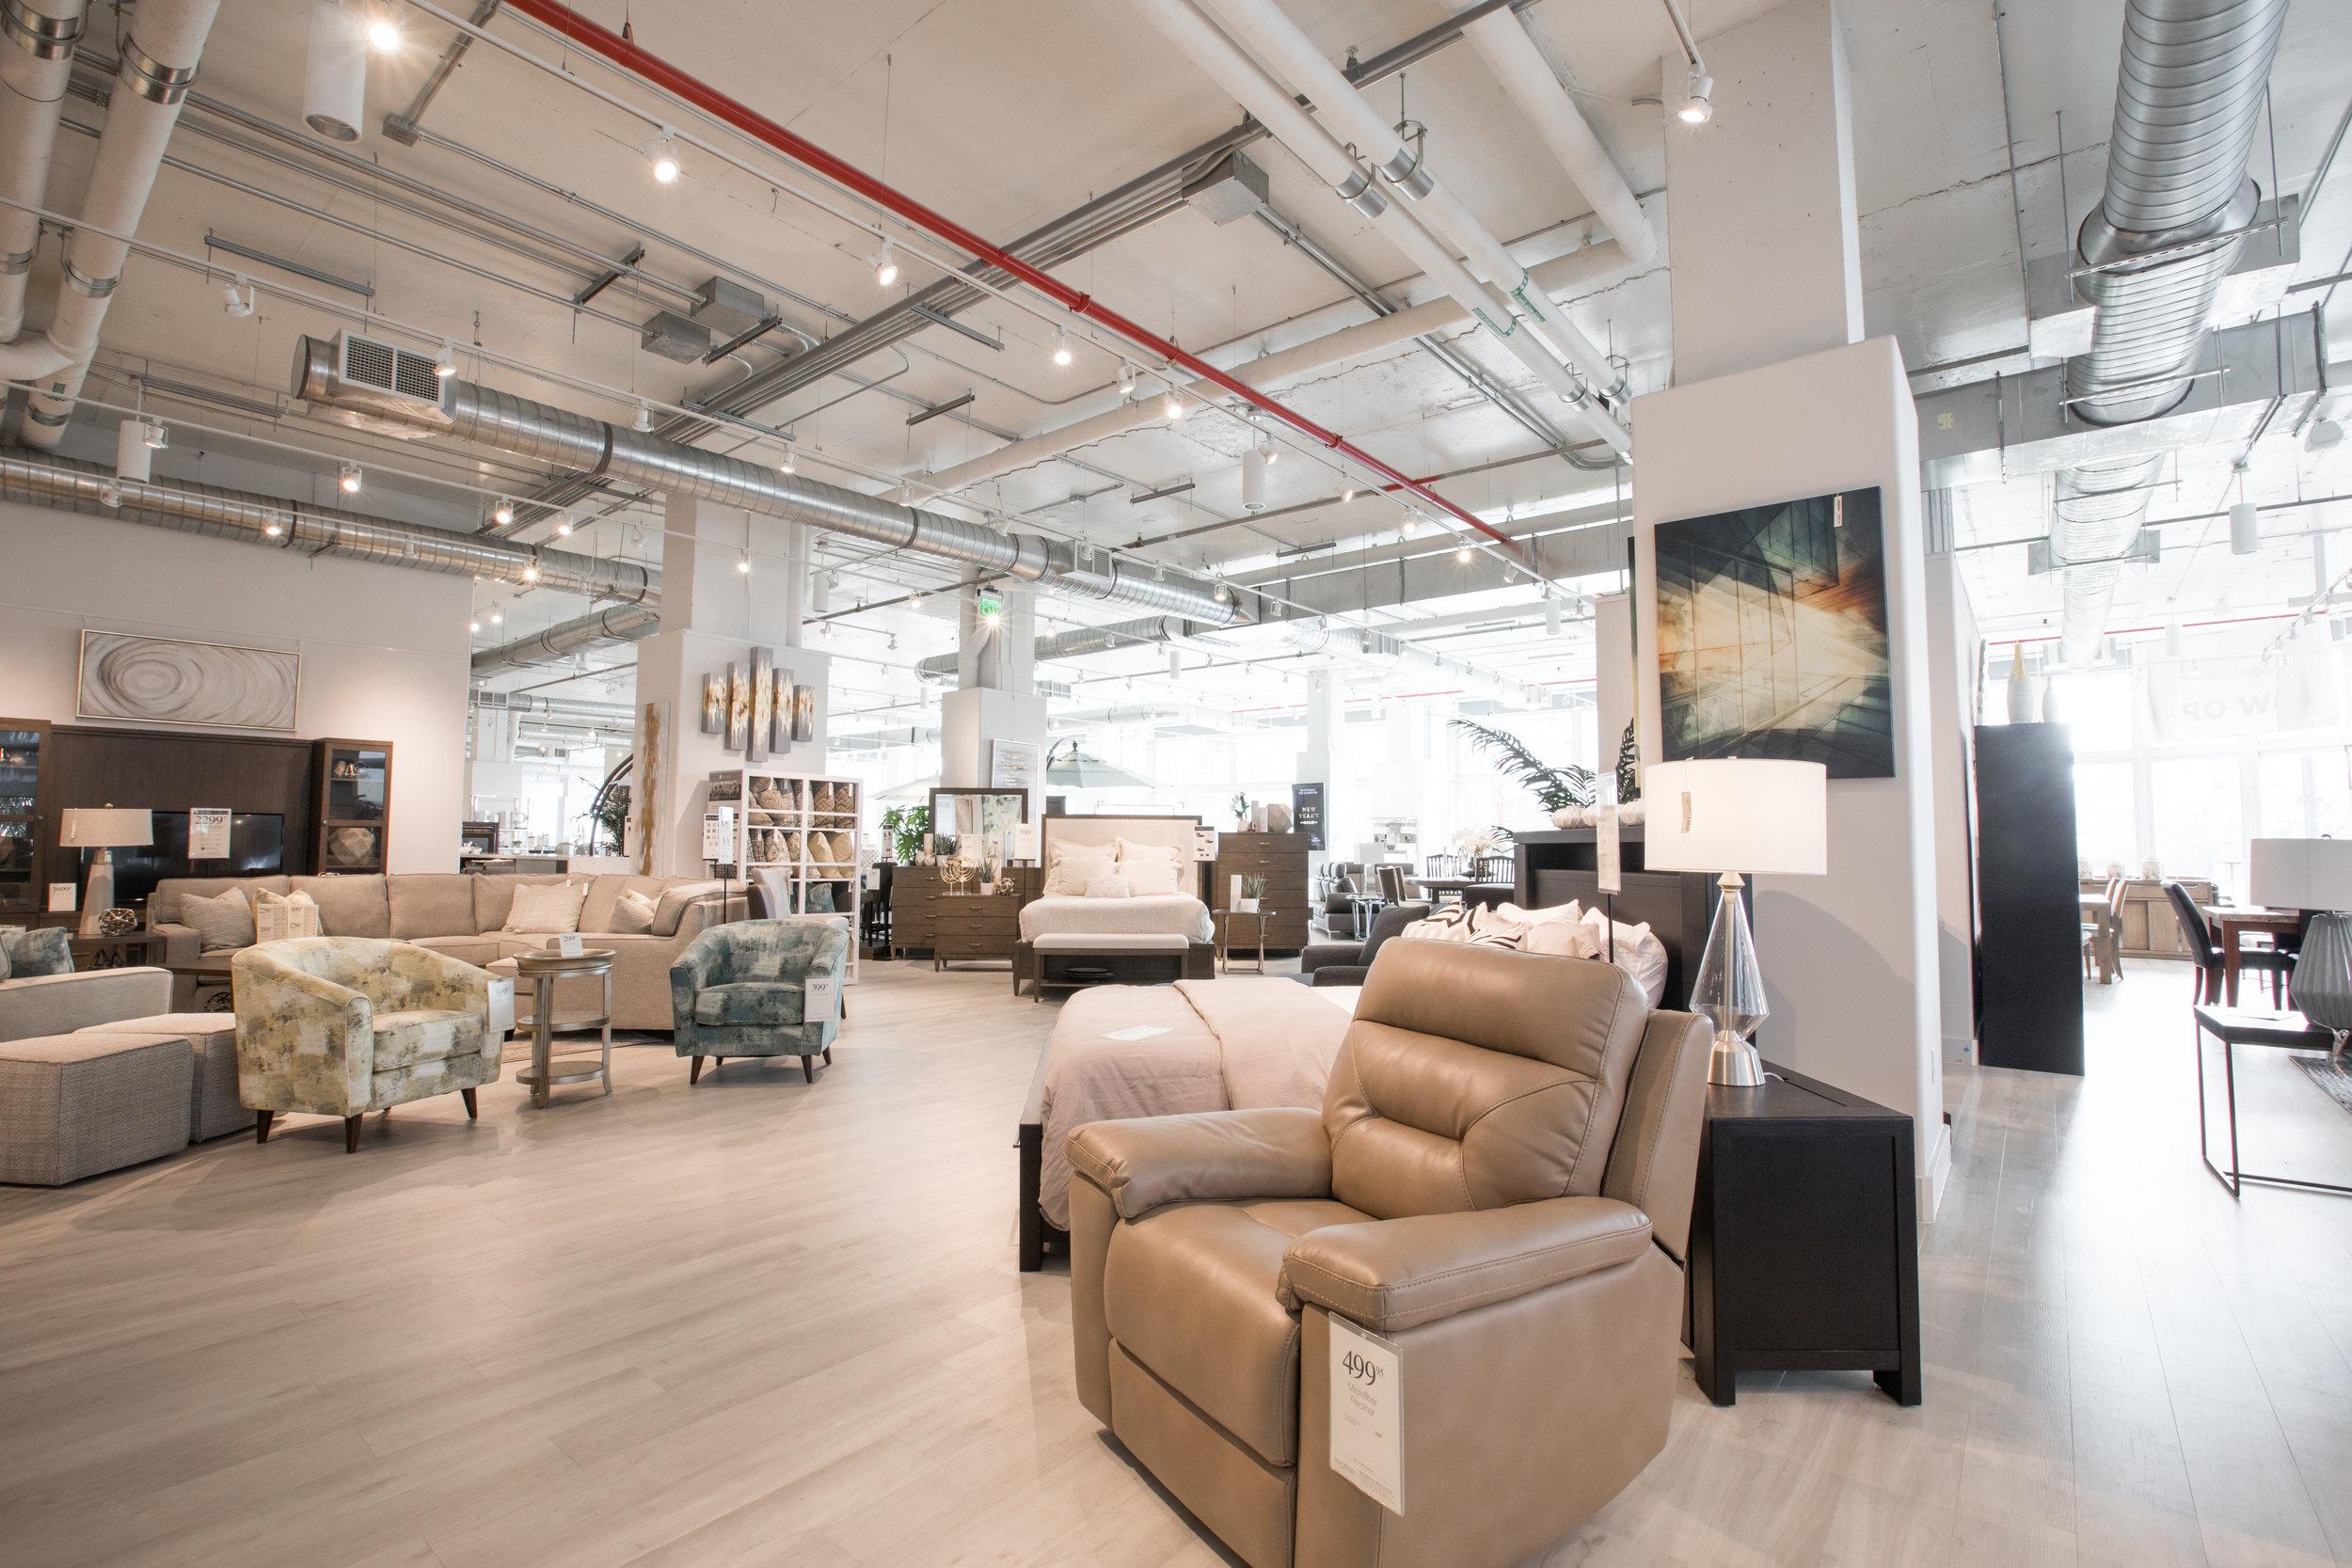 City Furniture Design District - 3